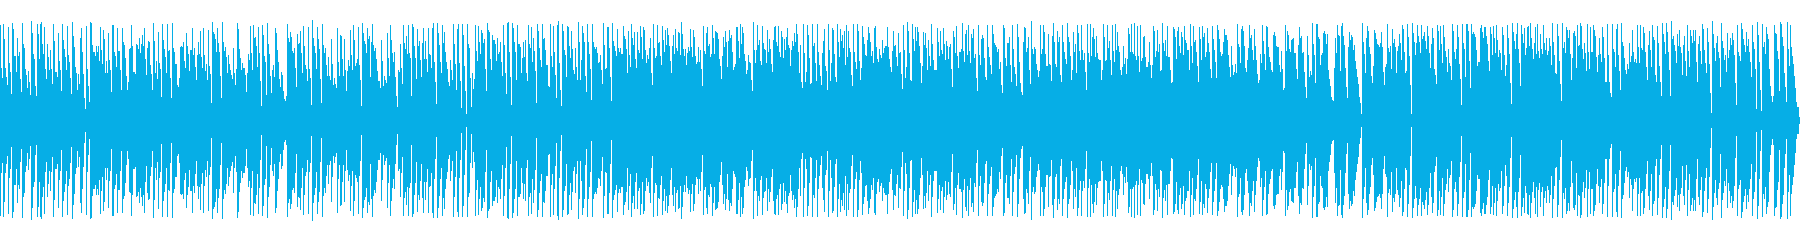 BGM013-06 ファミコンサウンド…の再生済みの波形